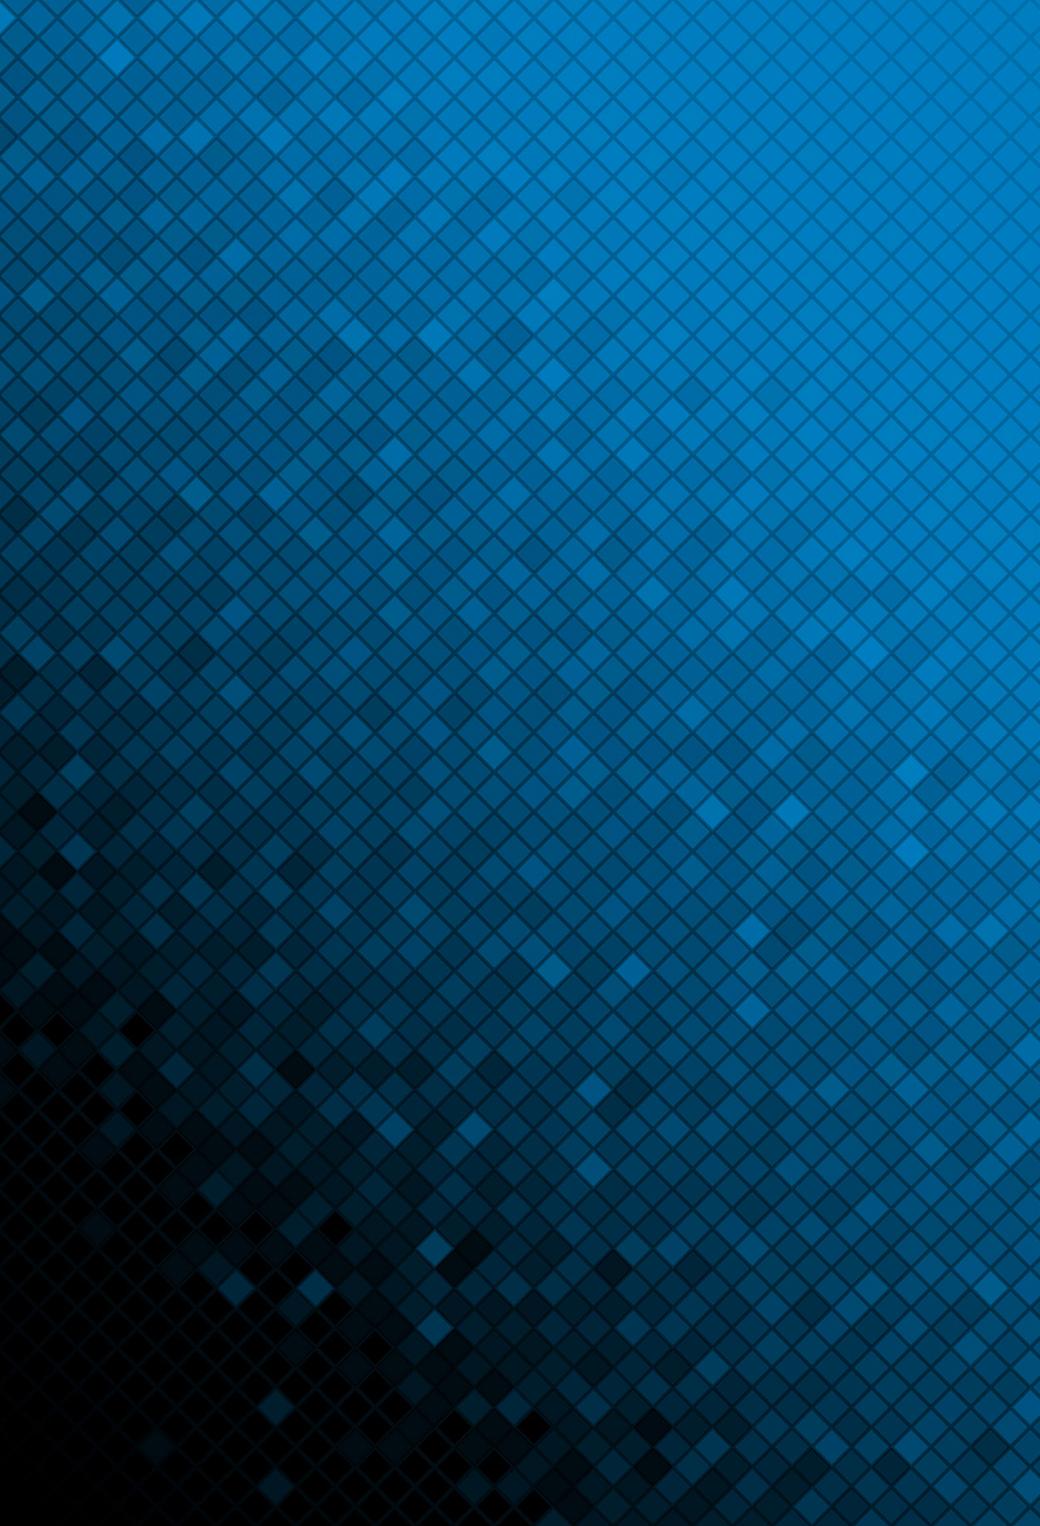 wallpaper hd iphone blue mosaic free download